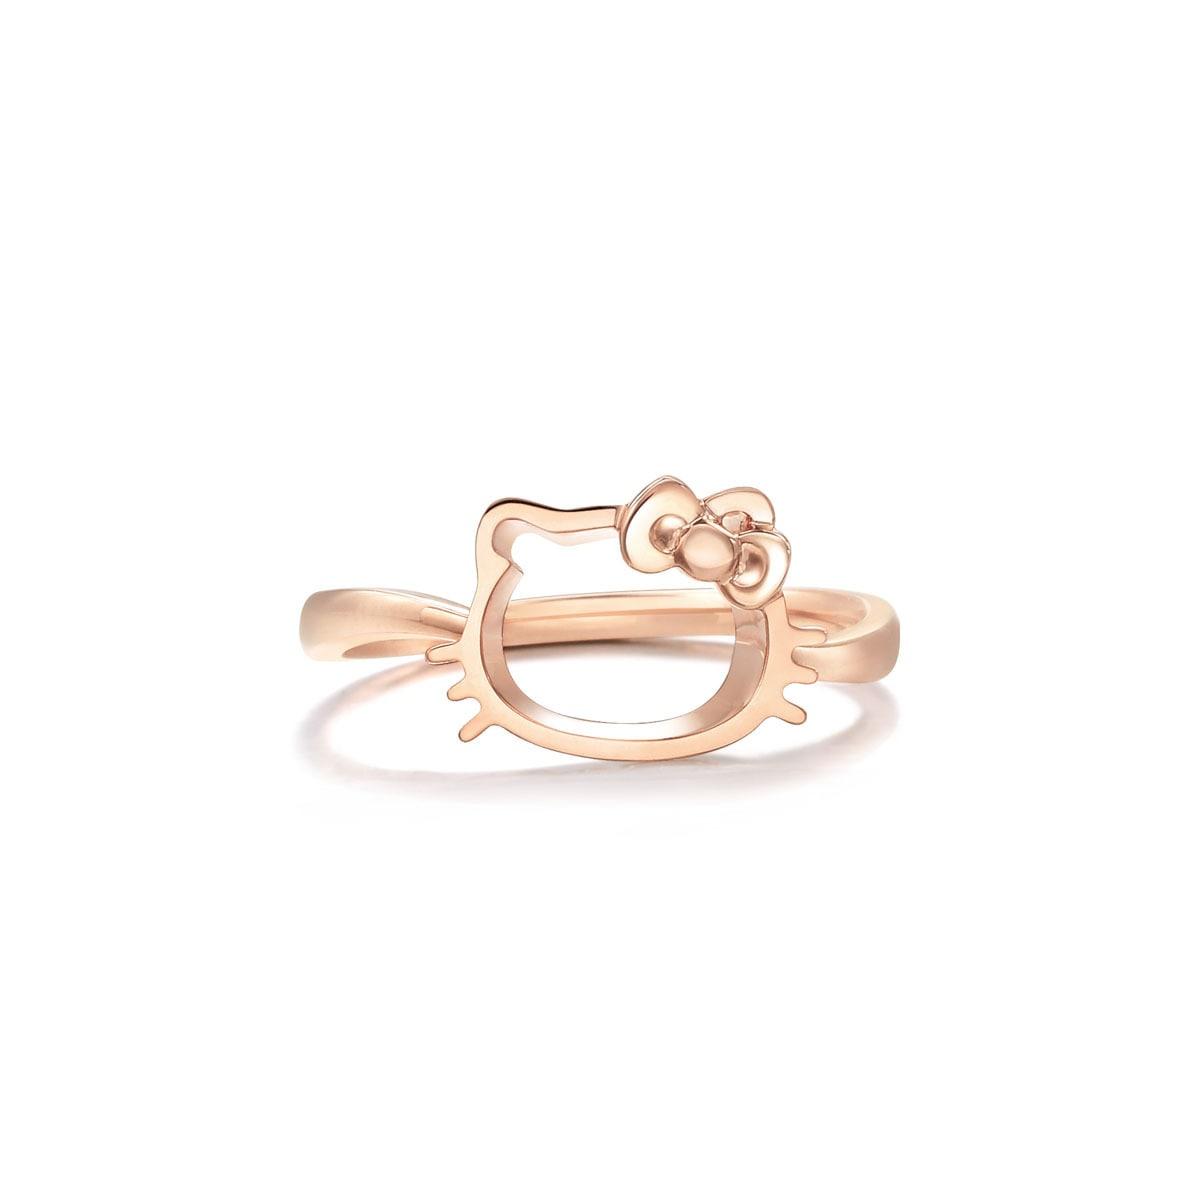 Sanrio Hello Kitty 18k Gold Ring Chow Sang Sang Jewellery Eshop